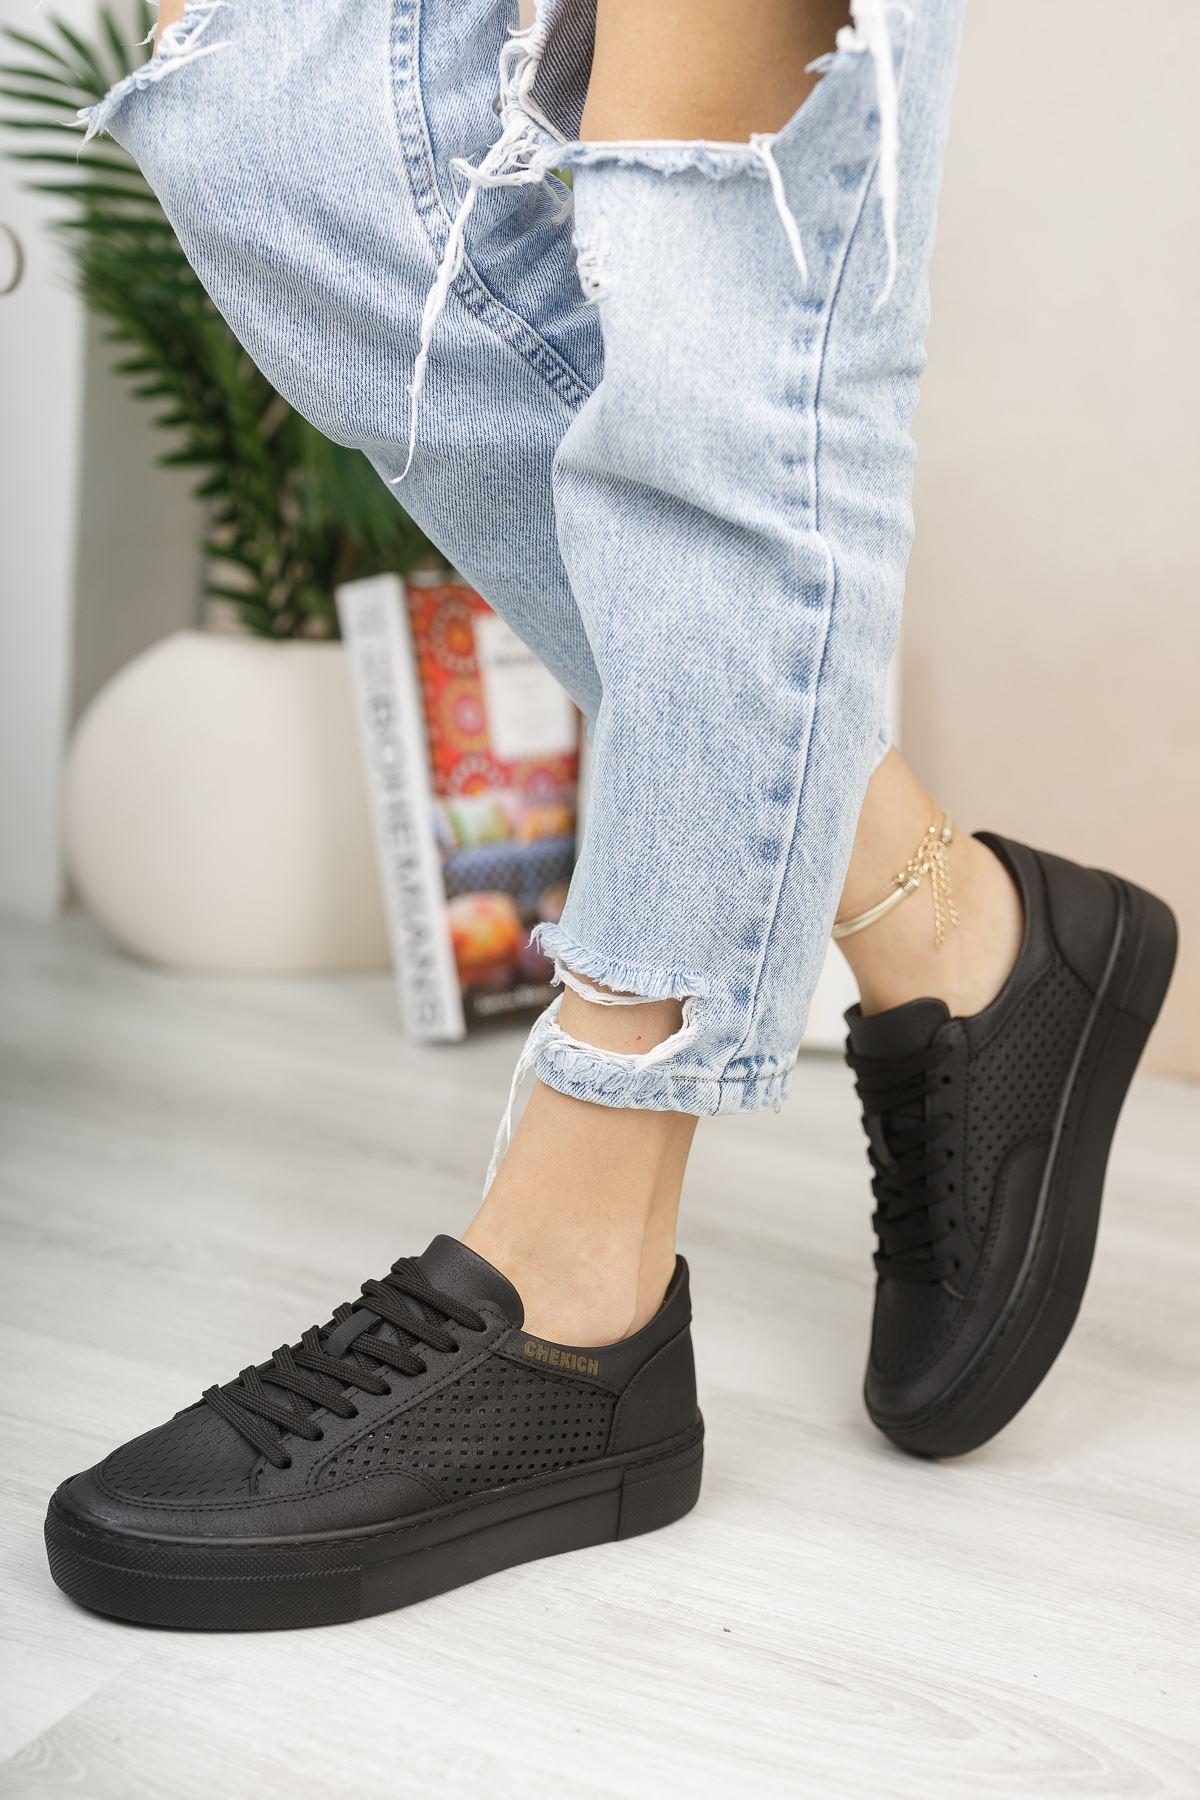 Chekich CH015 ST Kadın Ayakkabı SIYAH